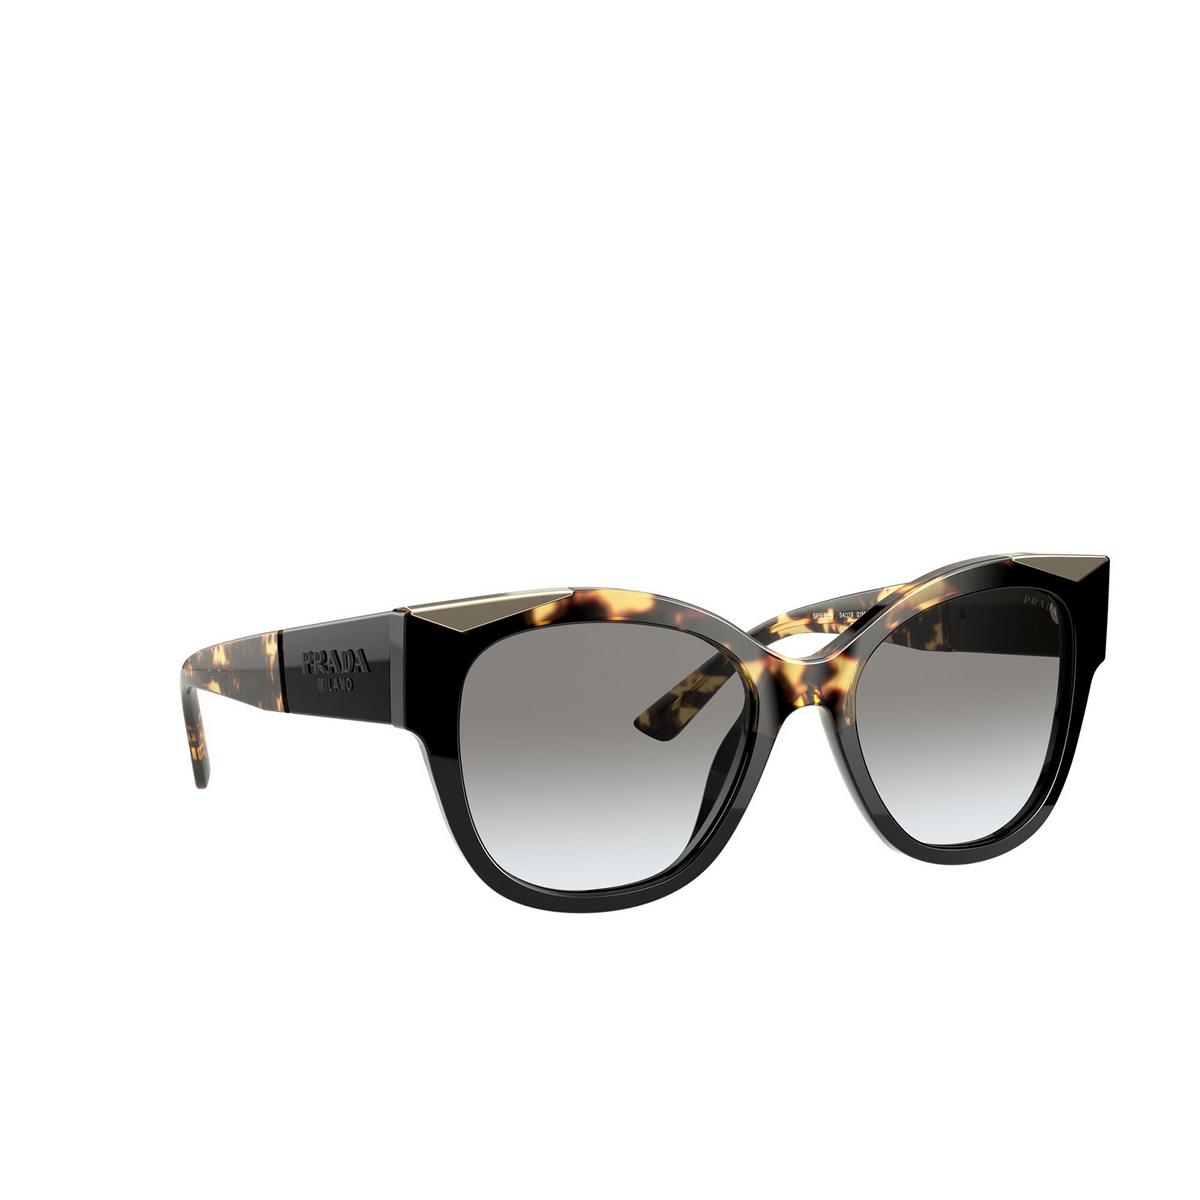 Prada® Butterfly Sunglasses: PR 02WS color Black / Medium Havana 01M0A7 - three-quarters view.